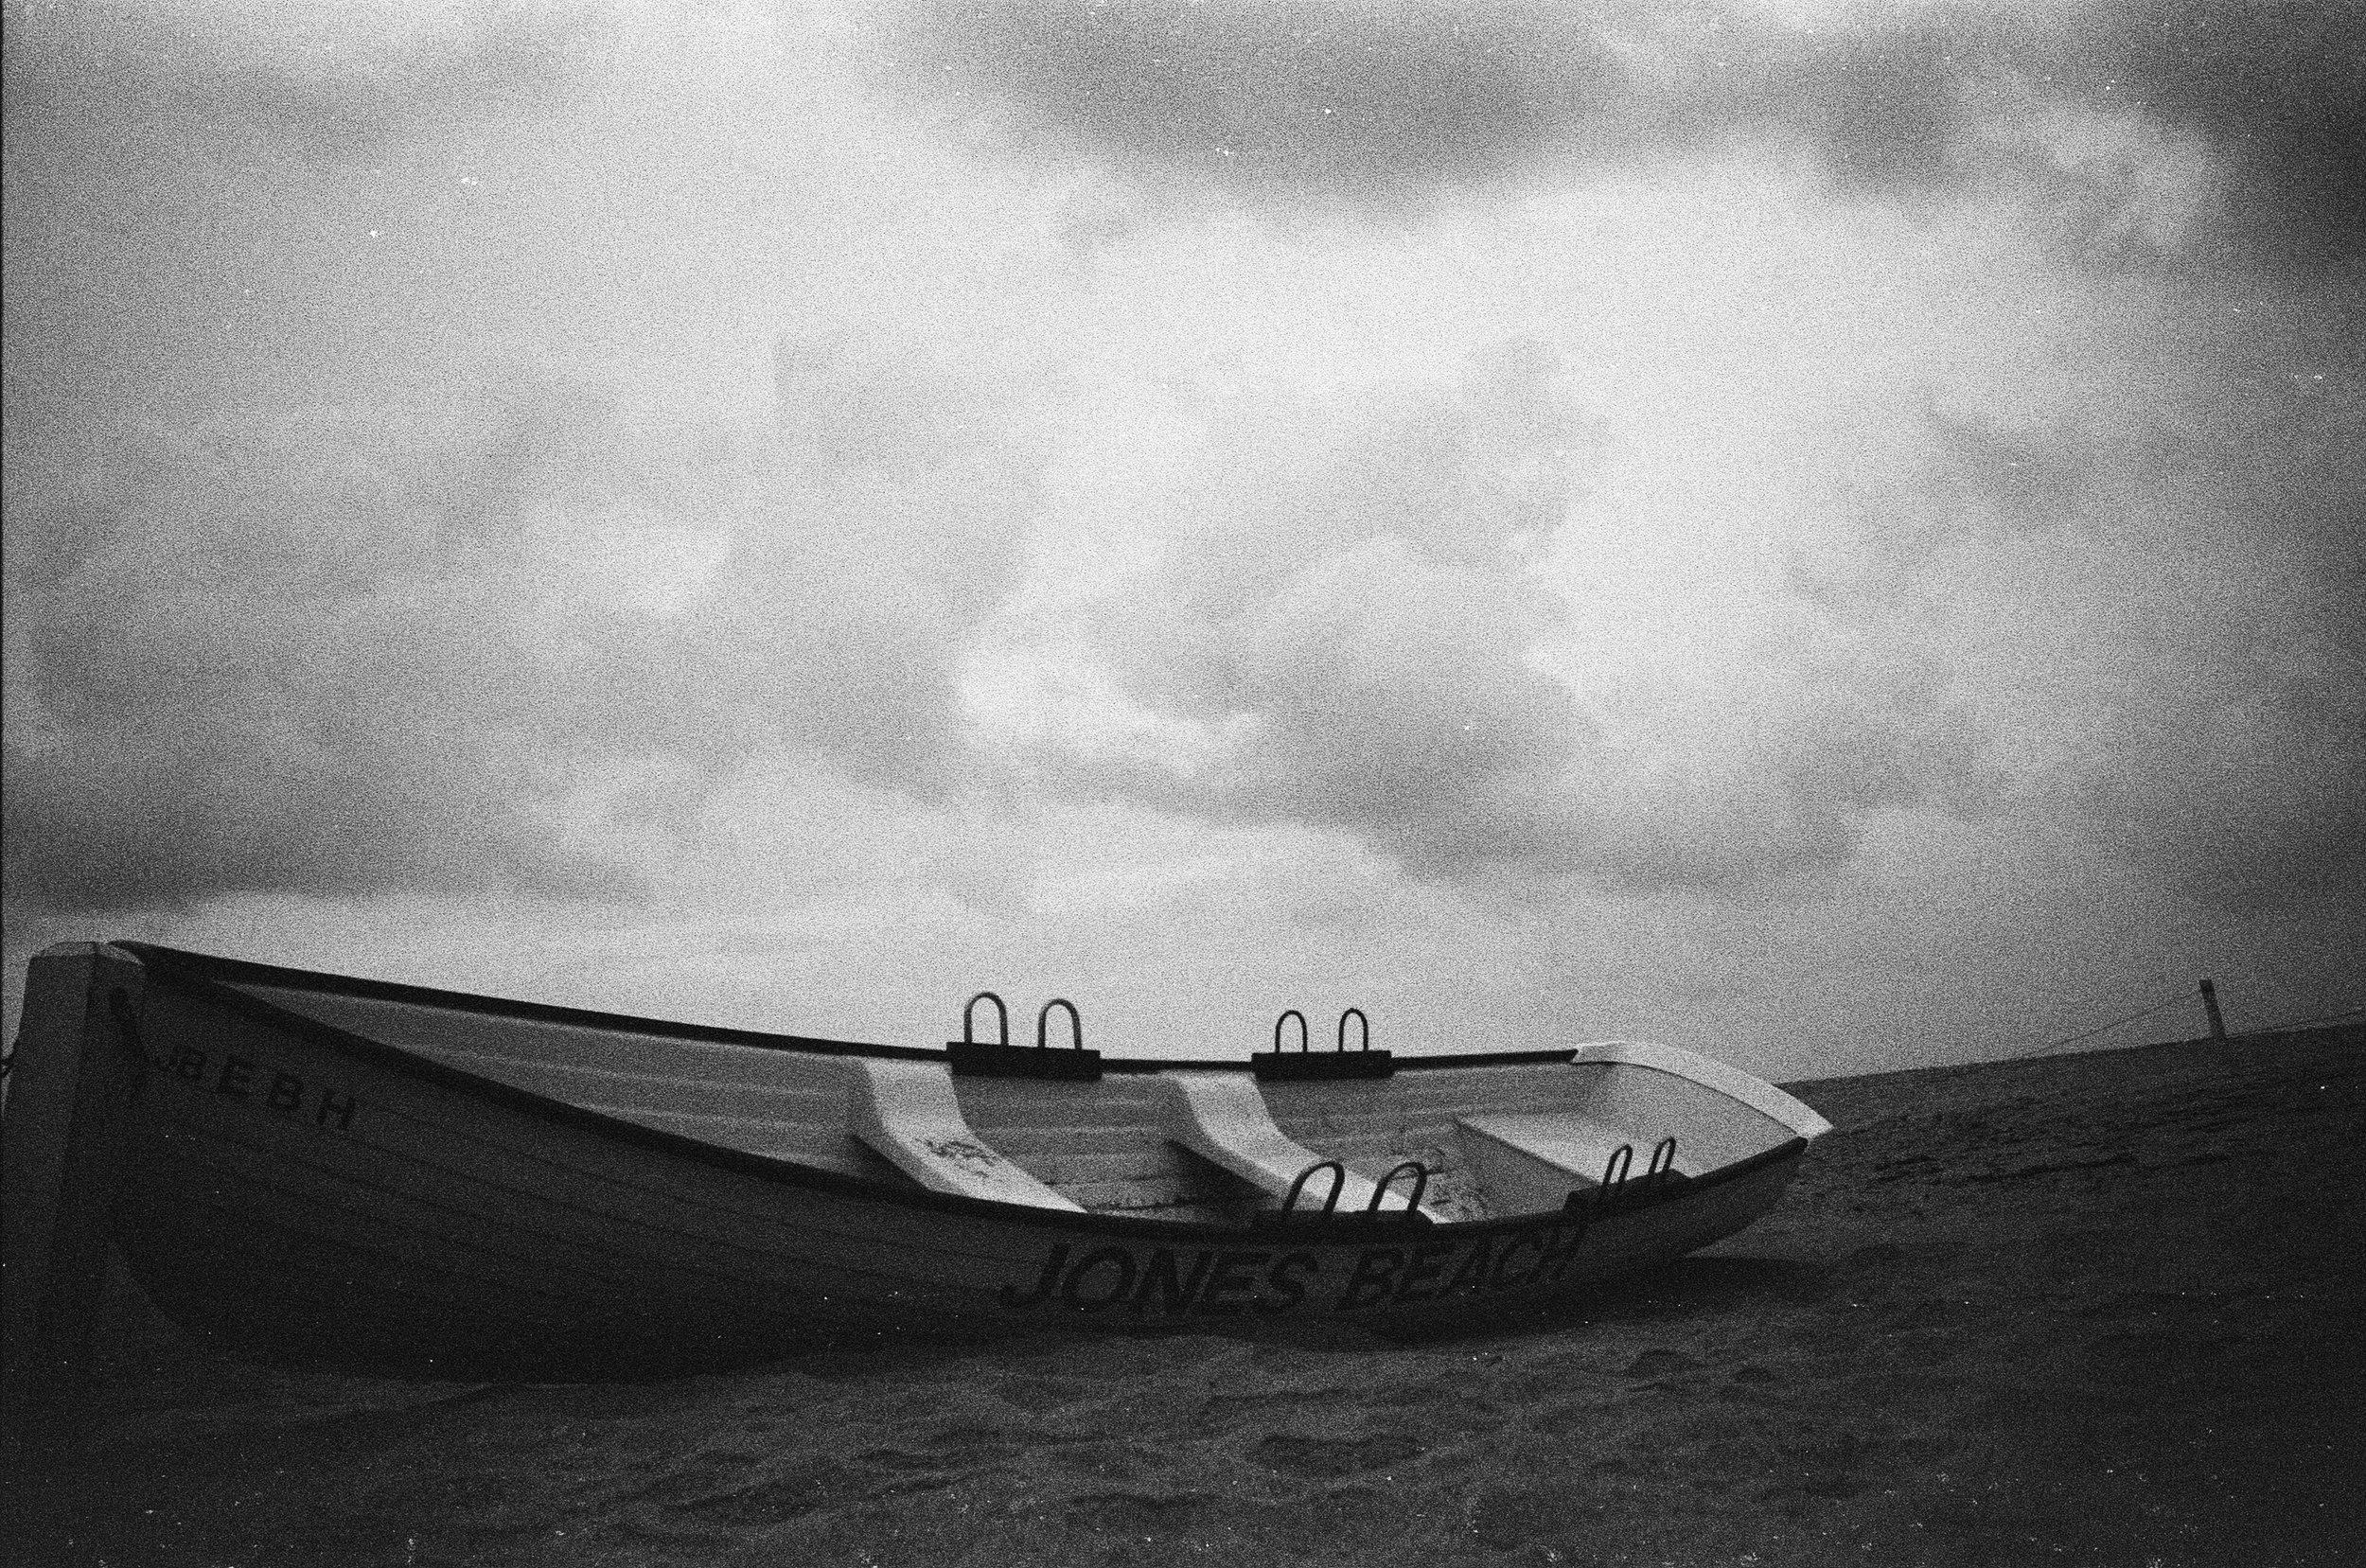 Boat_on_beach.jpg